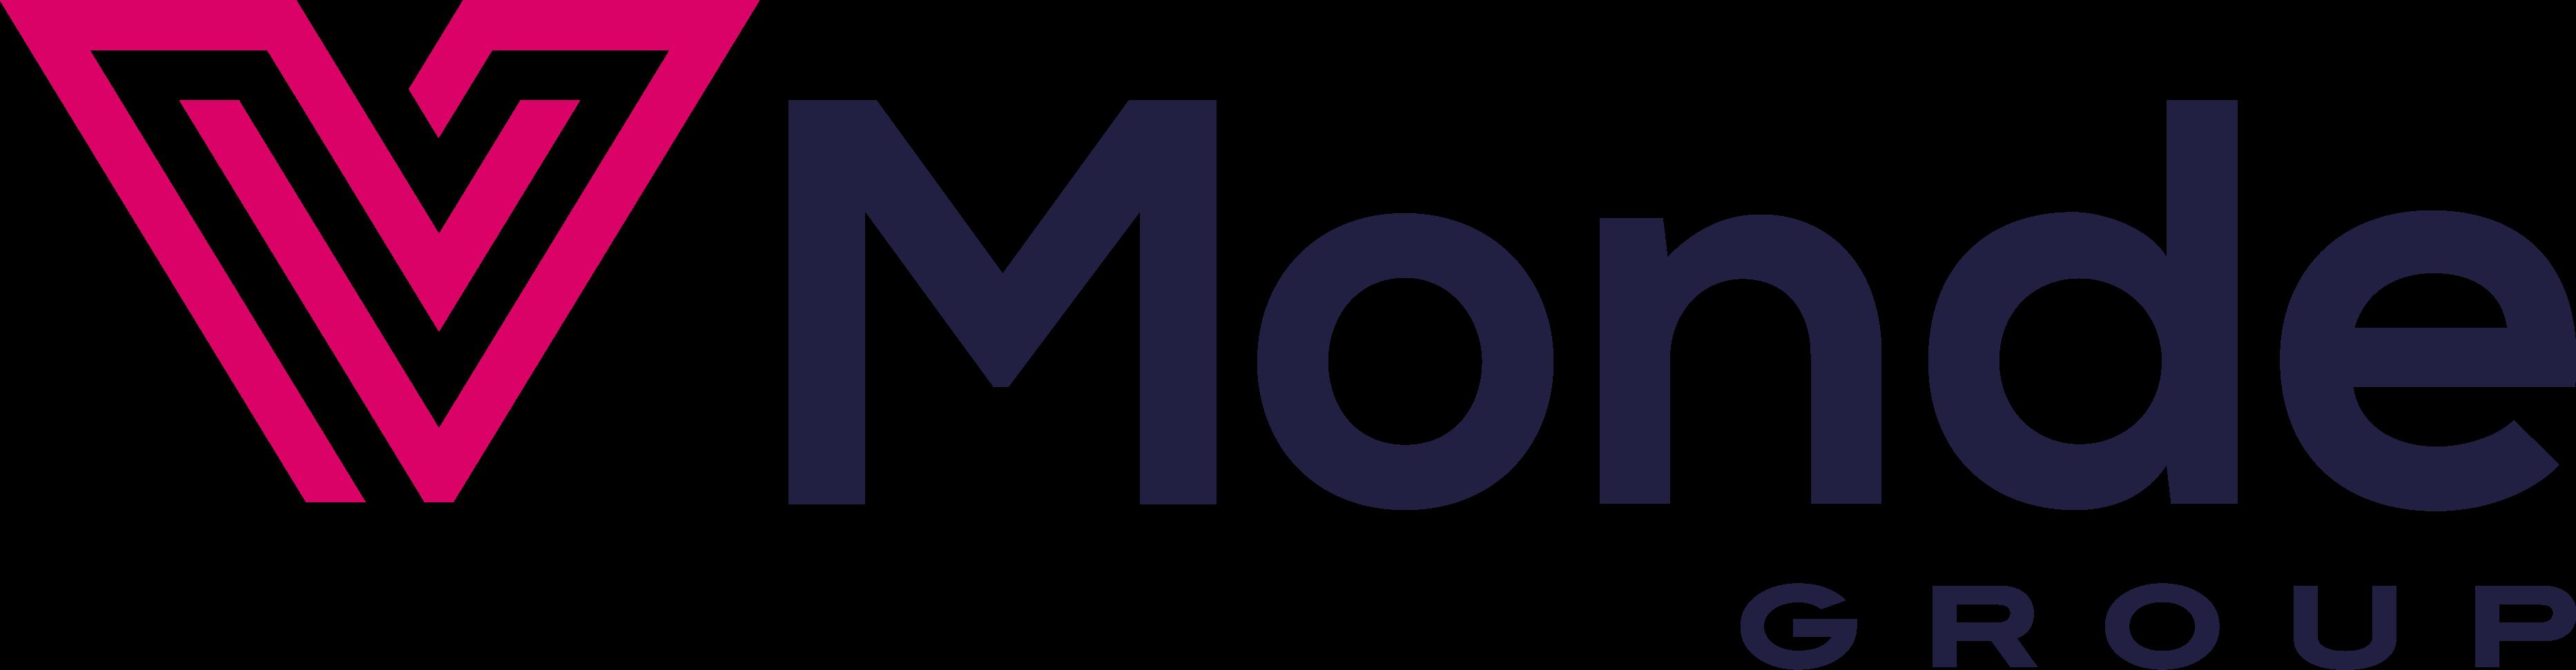 Best Php Framework 2020 15 Best PHP Frameworks for 2020   V Monde Group